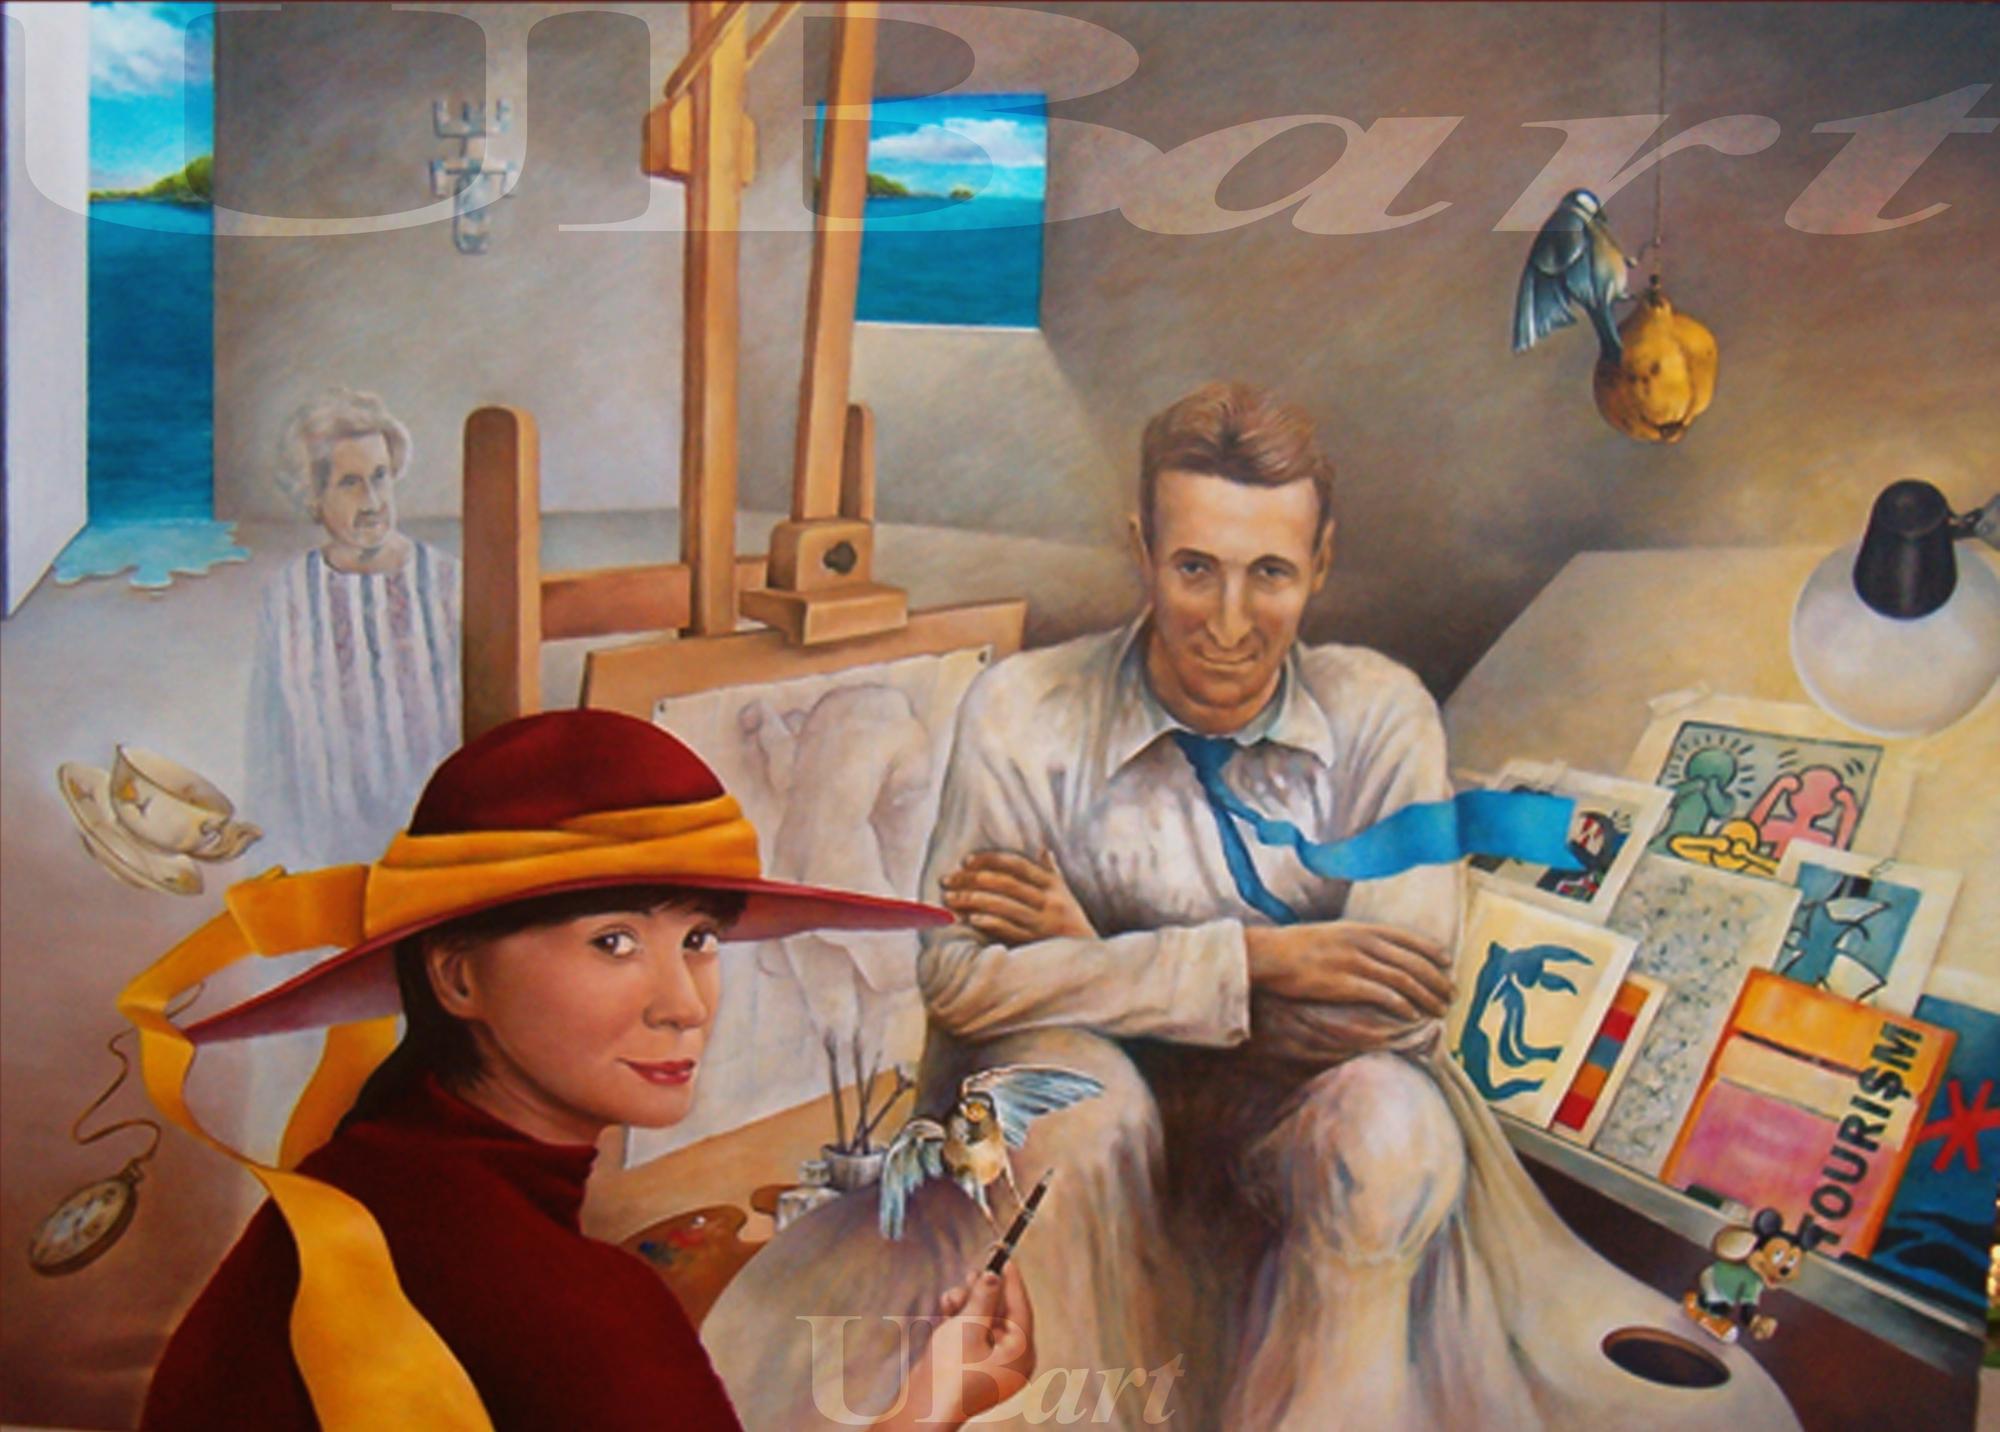 pintor con t de temporáneo